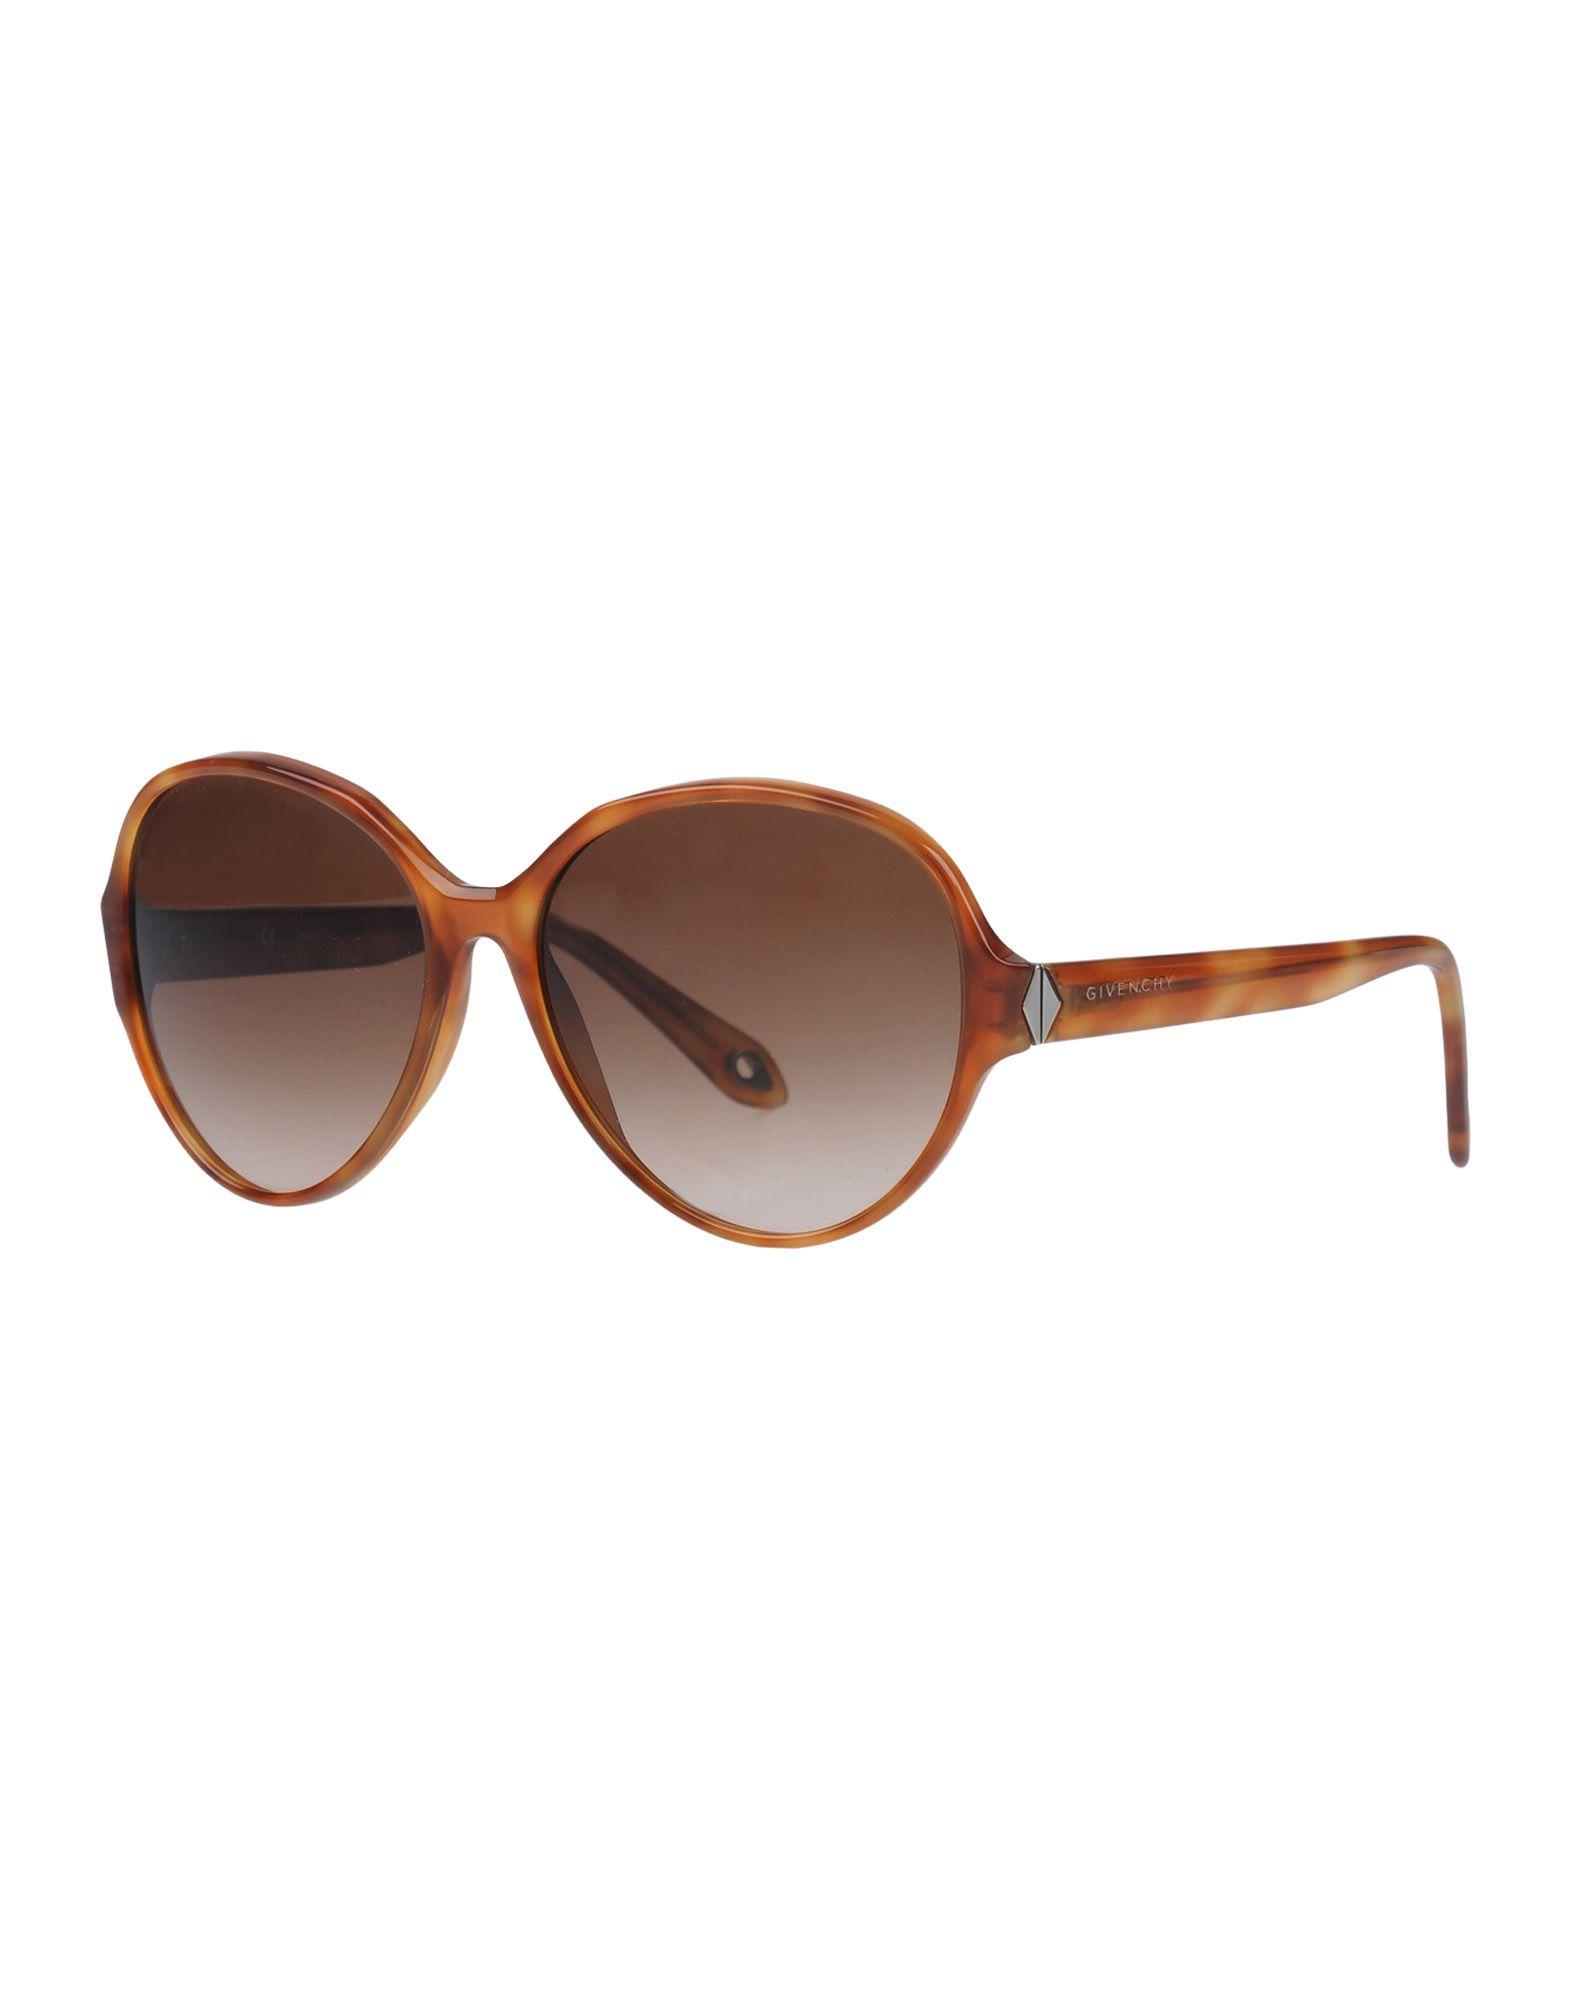 GIVENCHY Солнечные очки очки солнцезащитные givenchy givenchy gi007dwizb70